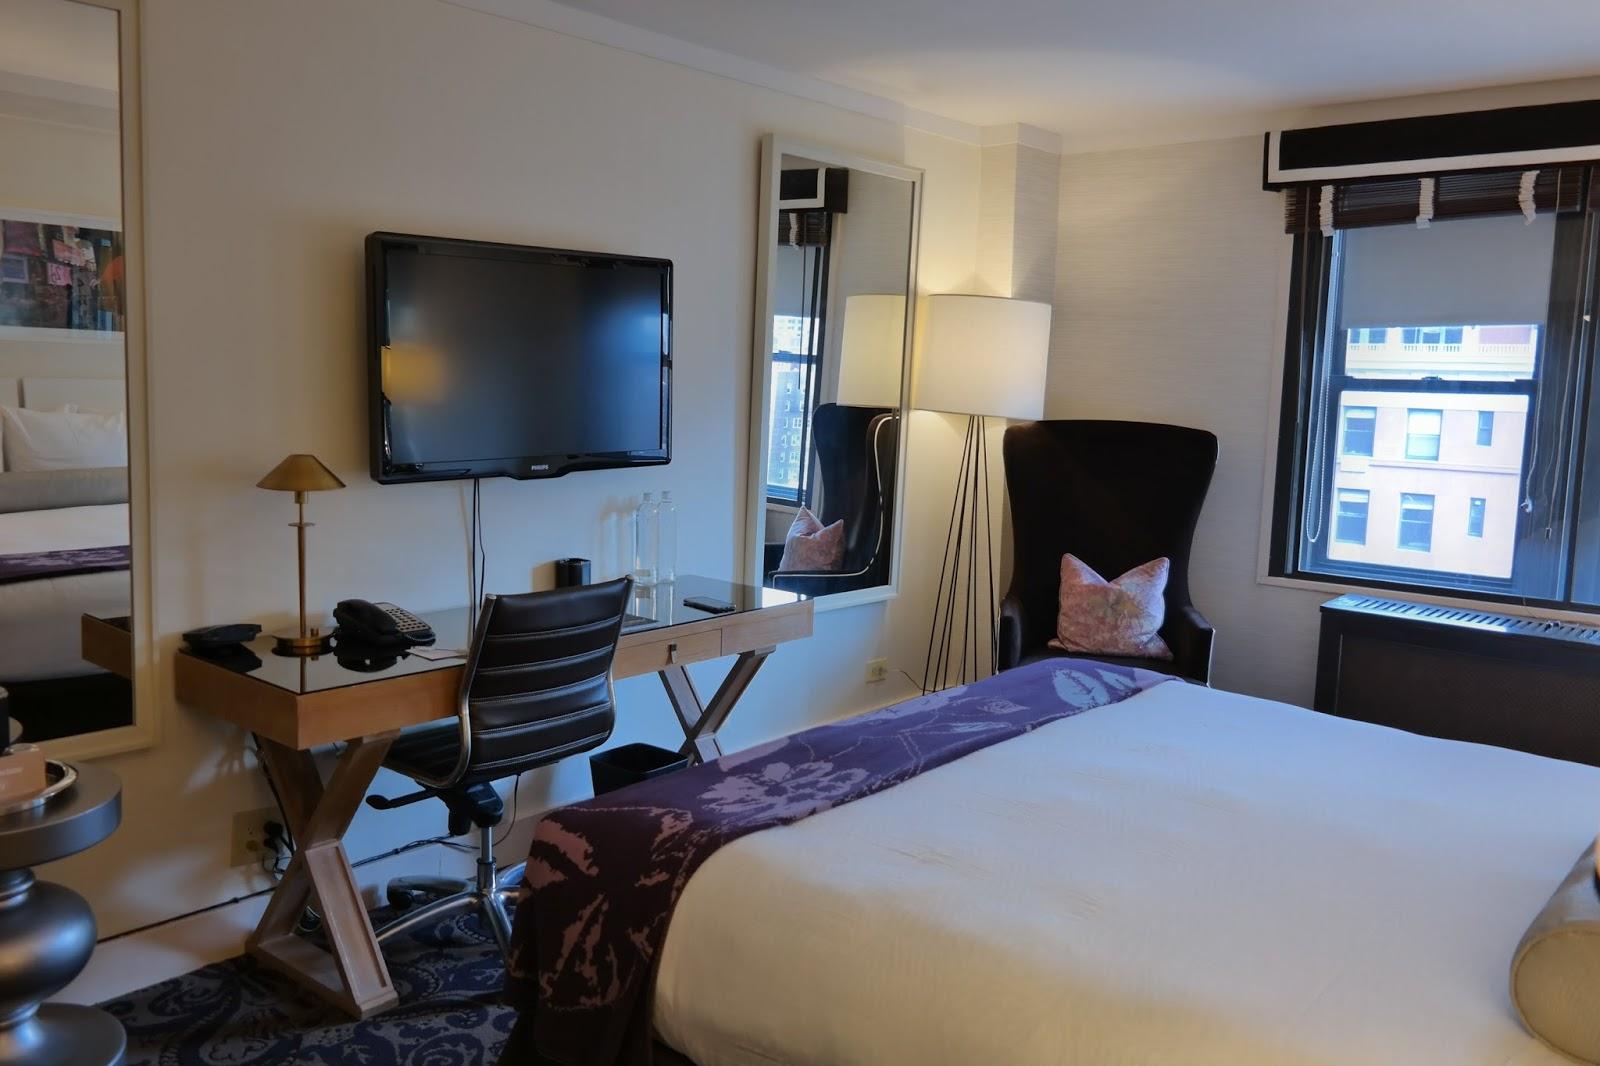 Park Avenue Hotel, New York Hotel, Iberostar Hotel New York